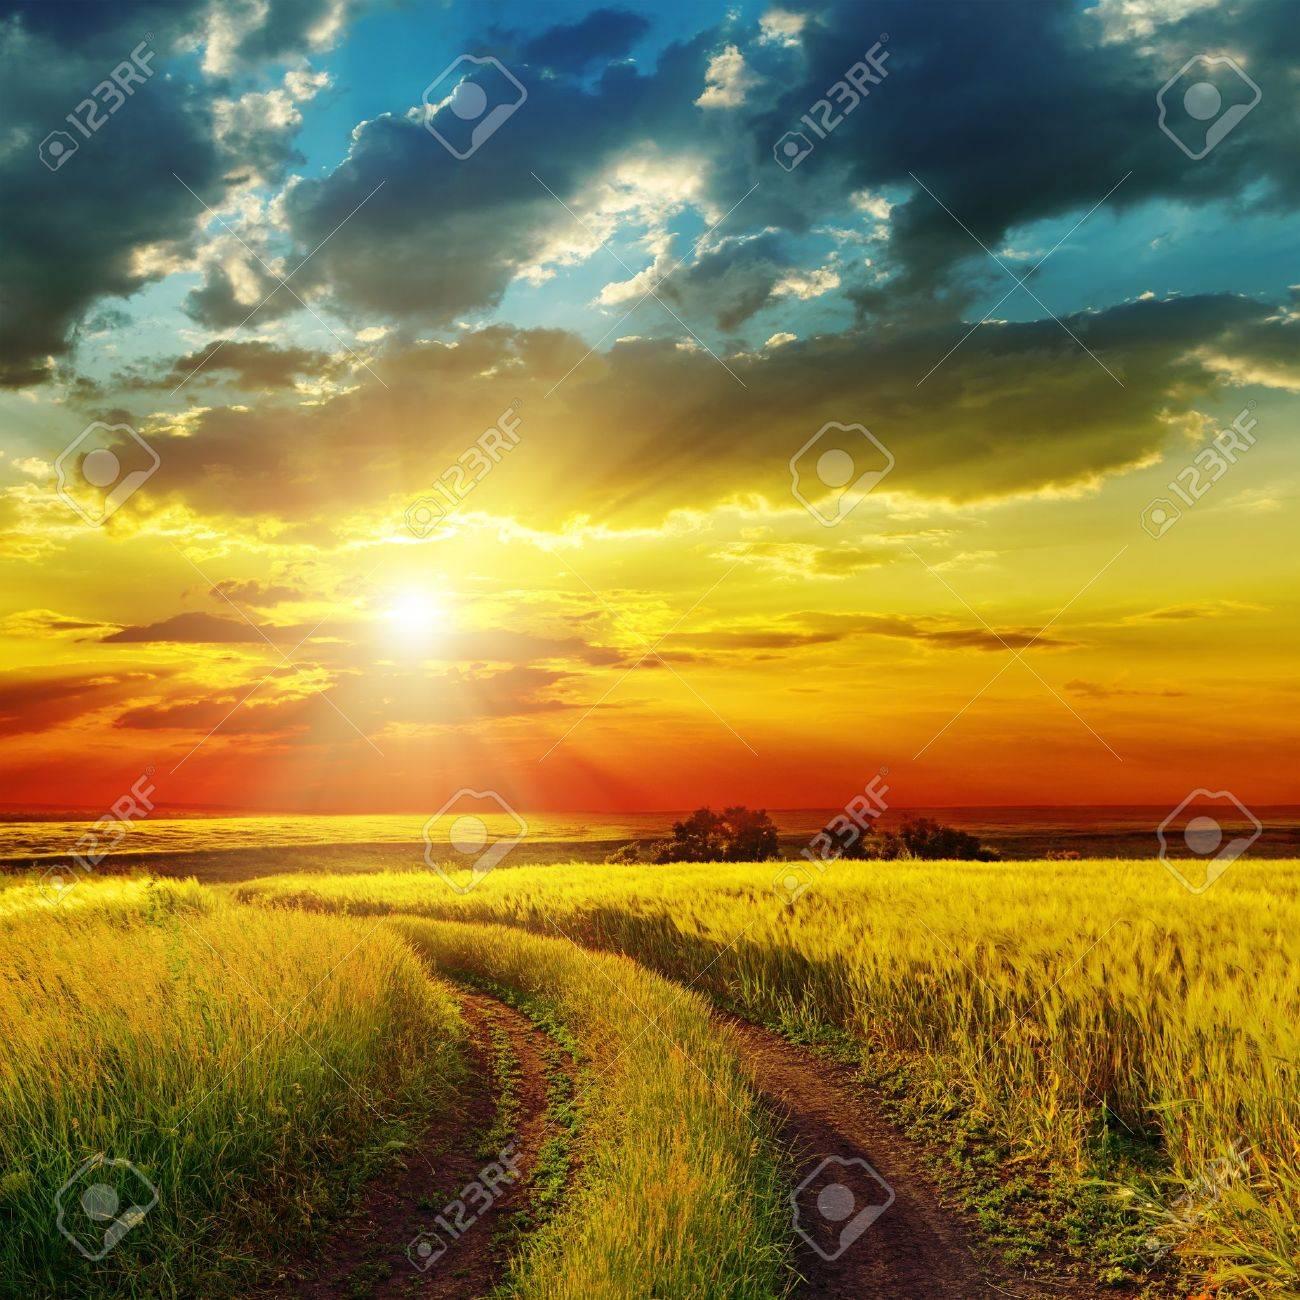 sunset over rural road near green field - 18006159